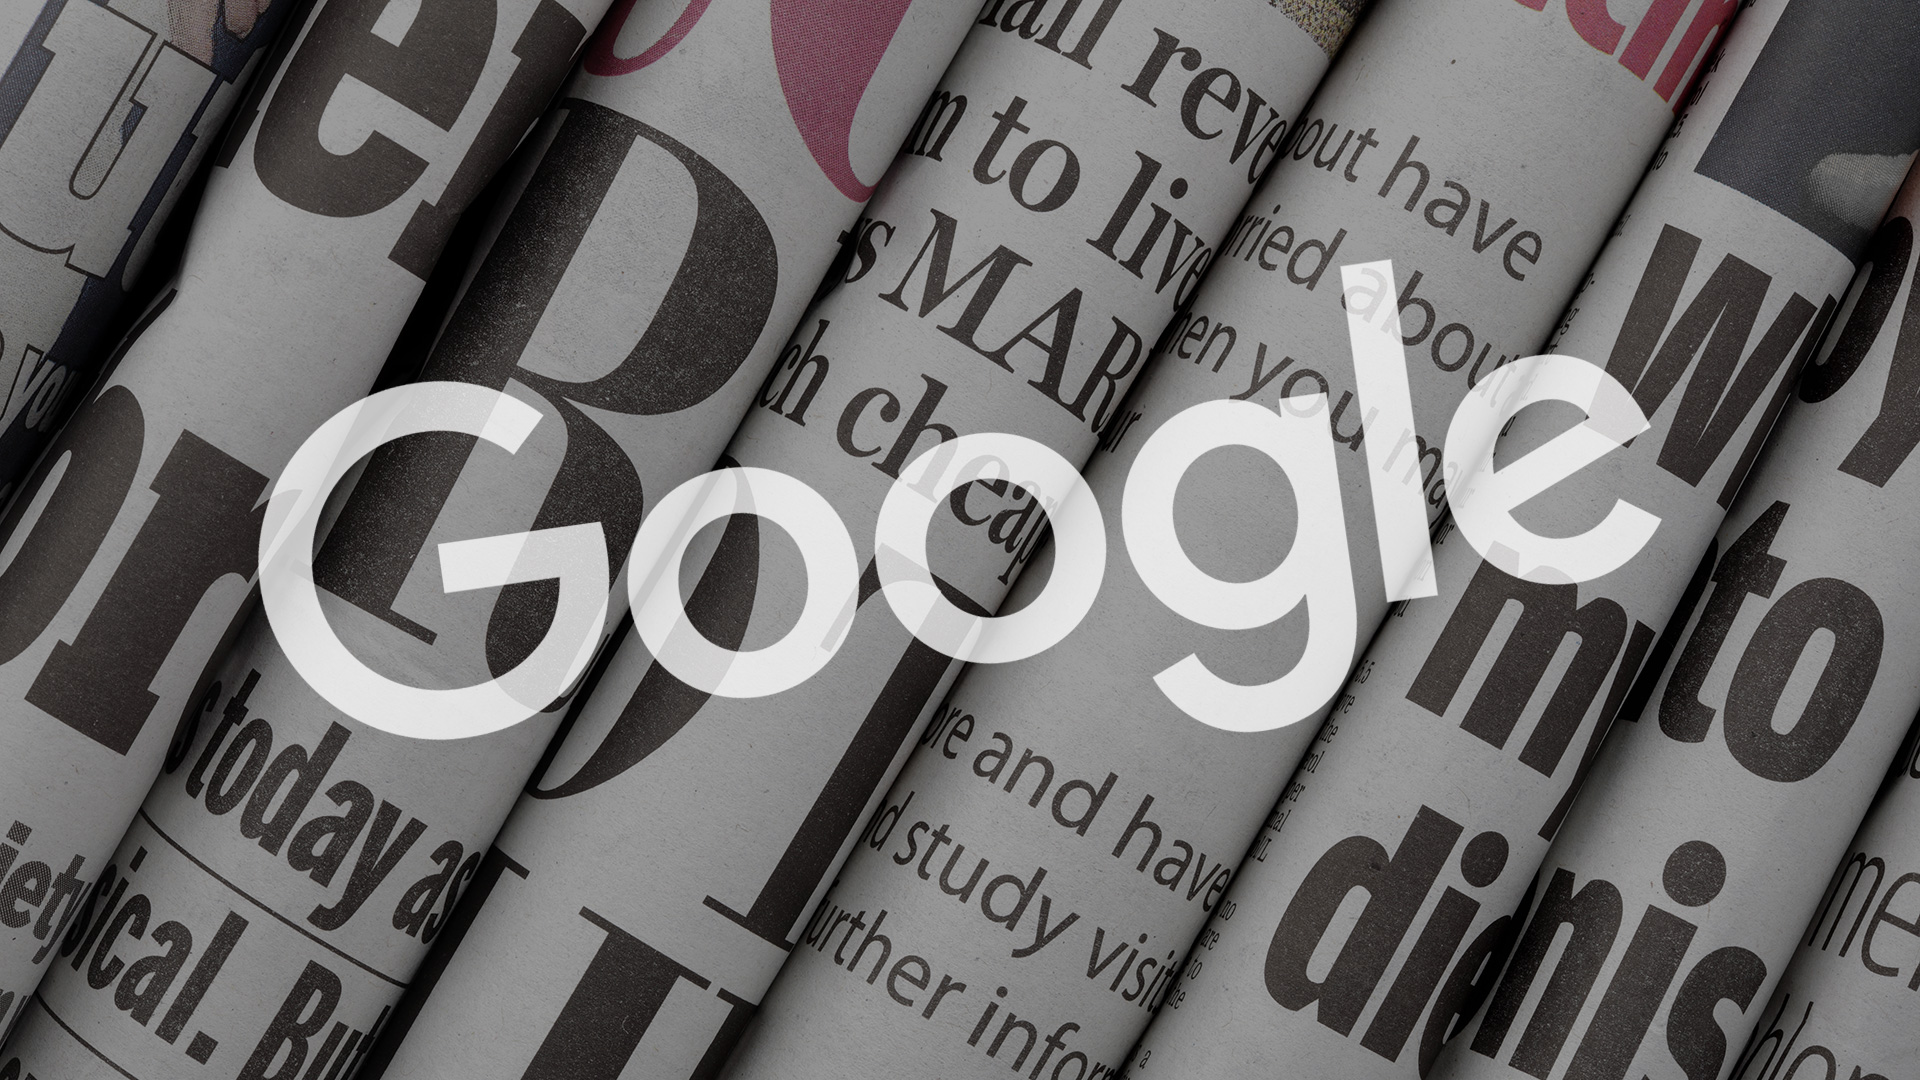 google-news-2015c-fade-ss-1920